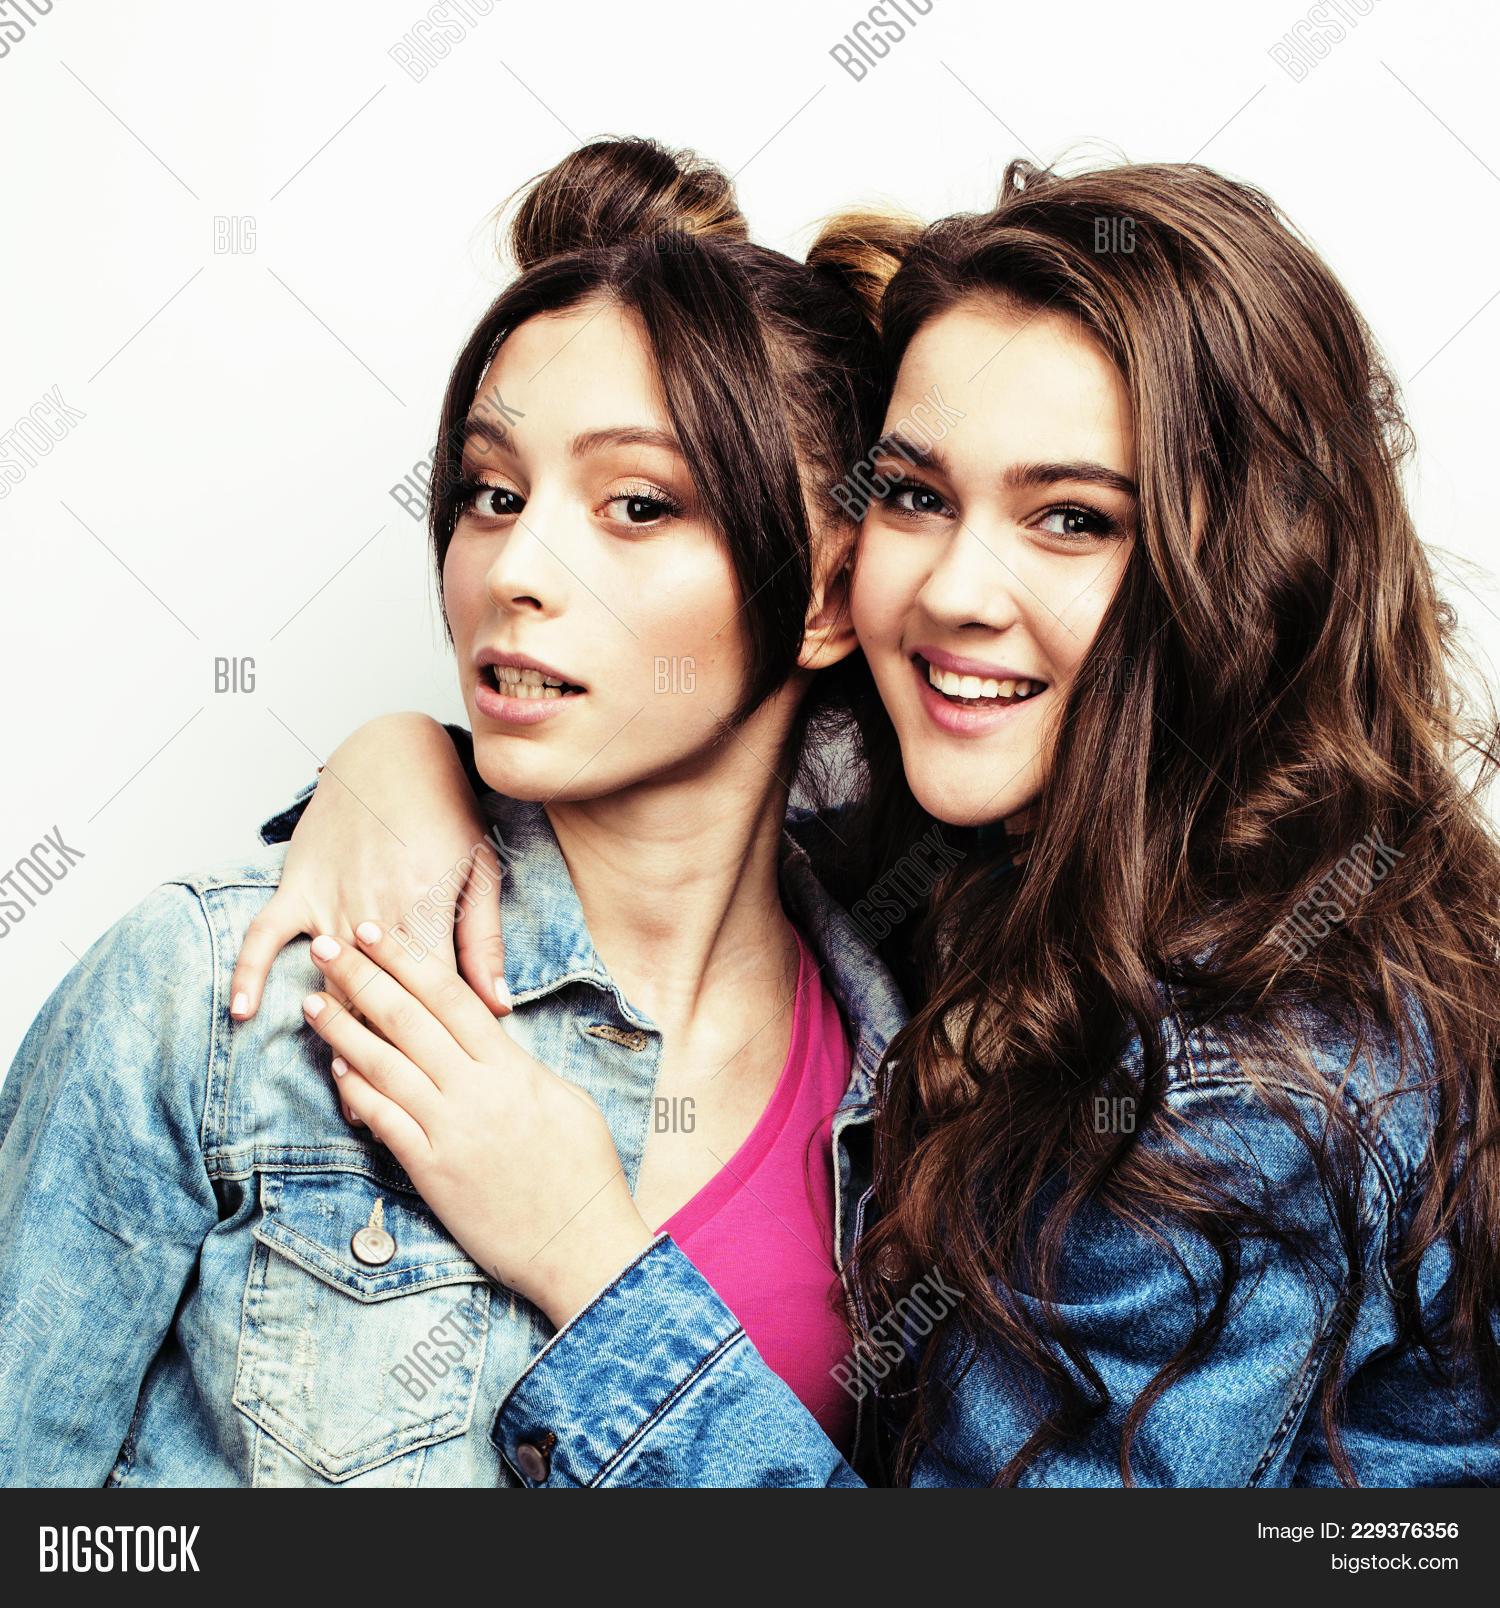 Two Best Friends Teenage Girls Together Having Fun Posing Emotional On White Background Besties